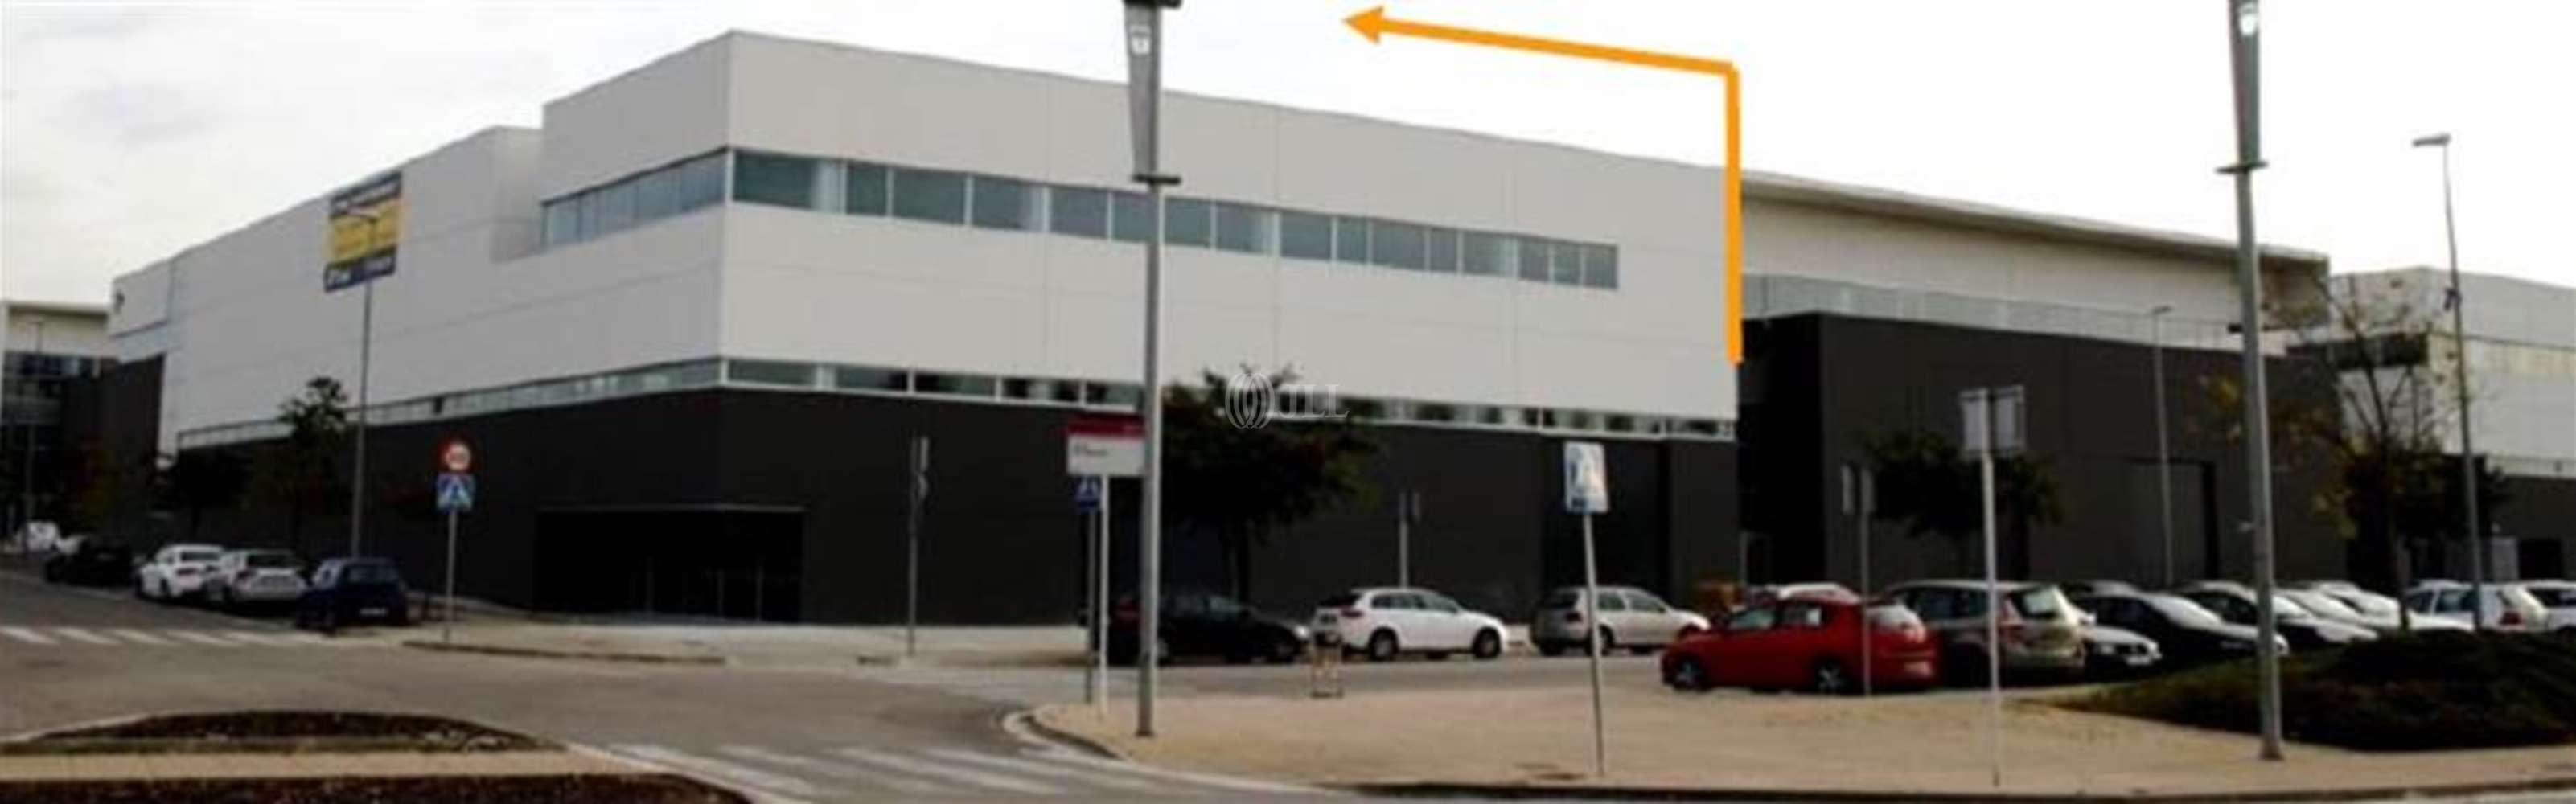 Naves industriales y logísticas Gavà, 08850 - Nave Industrial - B0083 -  PI GAVA PARK - 10509